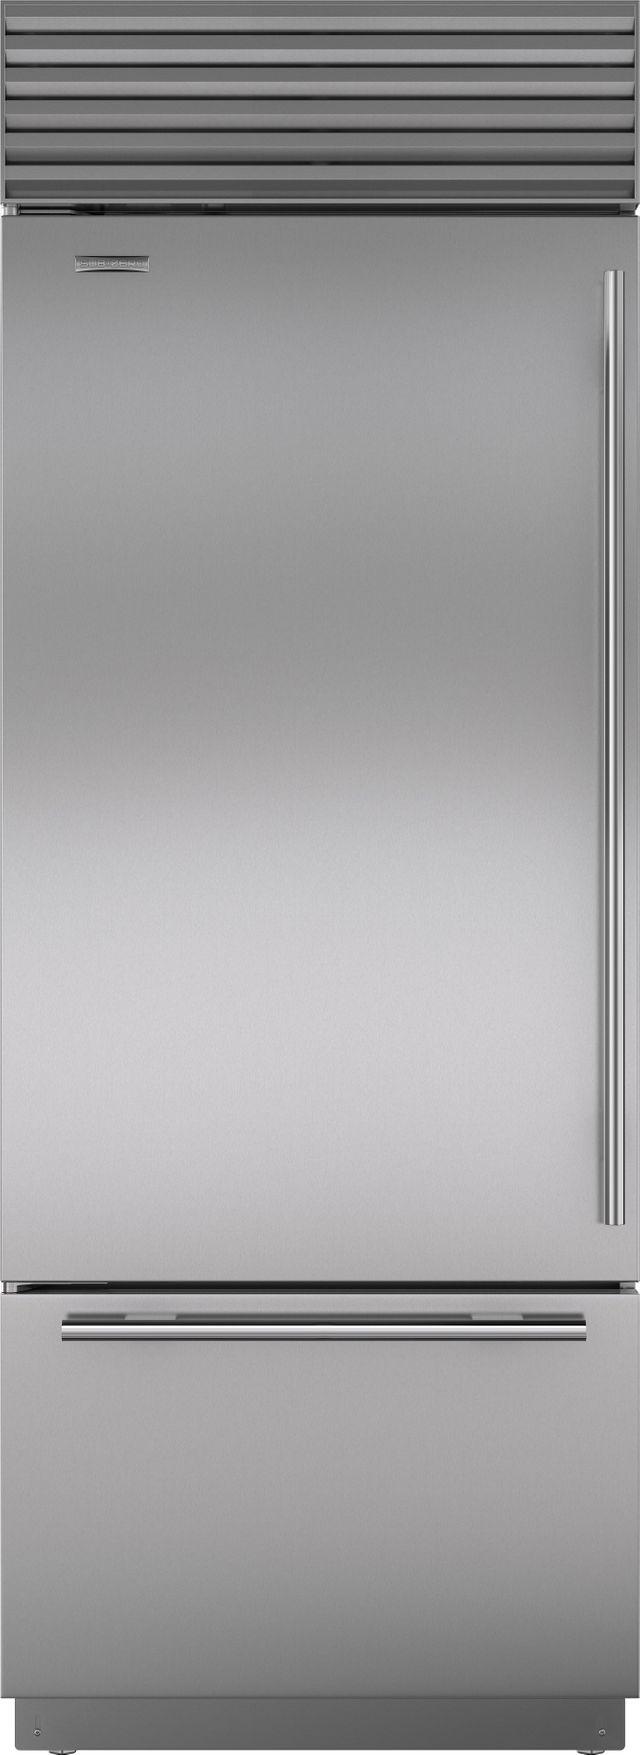 Sub-Zero® 17.4 Cu. Ft. Stainless Steel Bottom Freezer Refrigerator-BI-30U/S/TH-LH